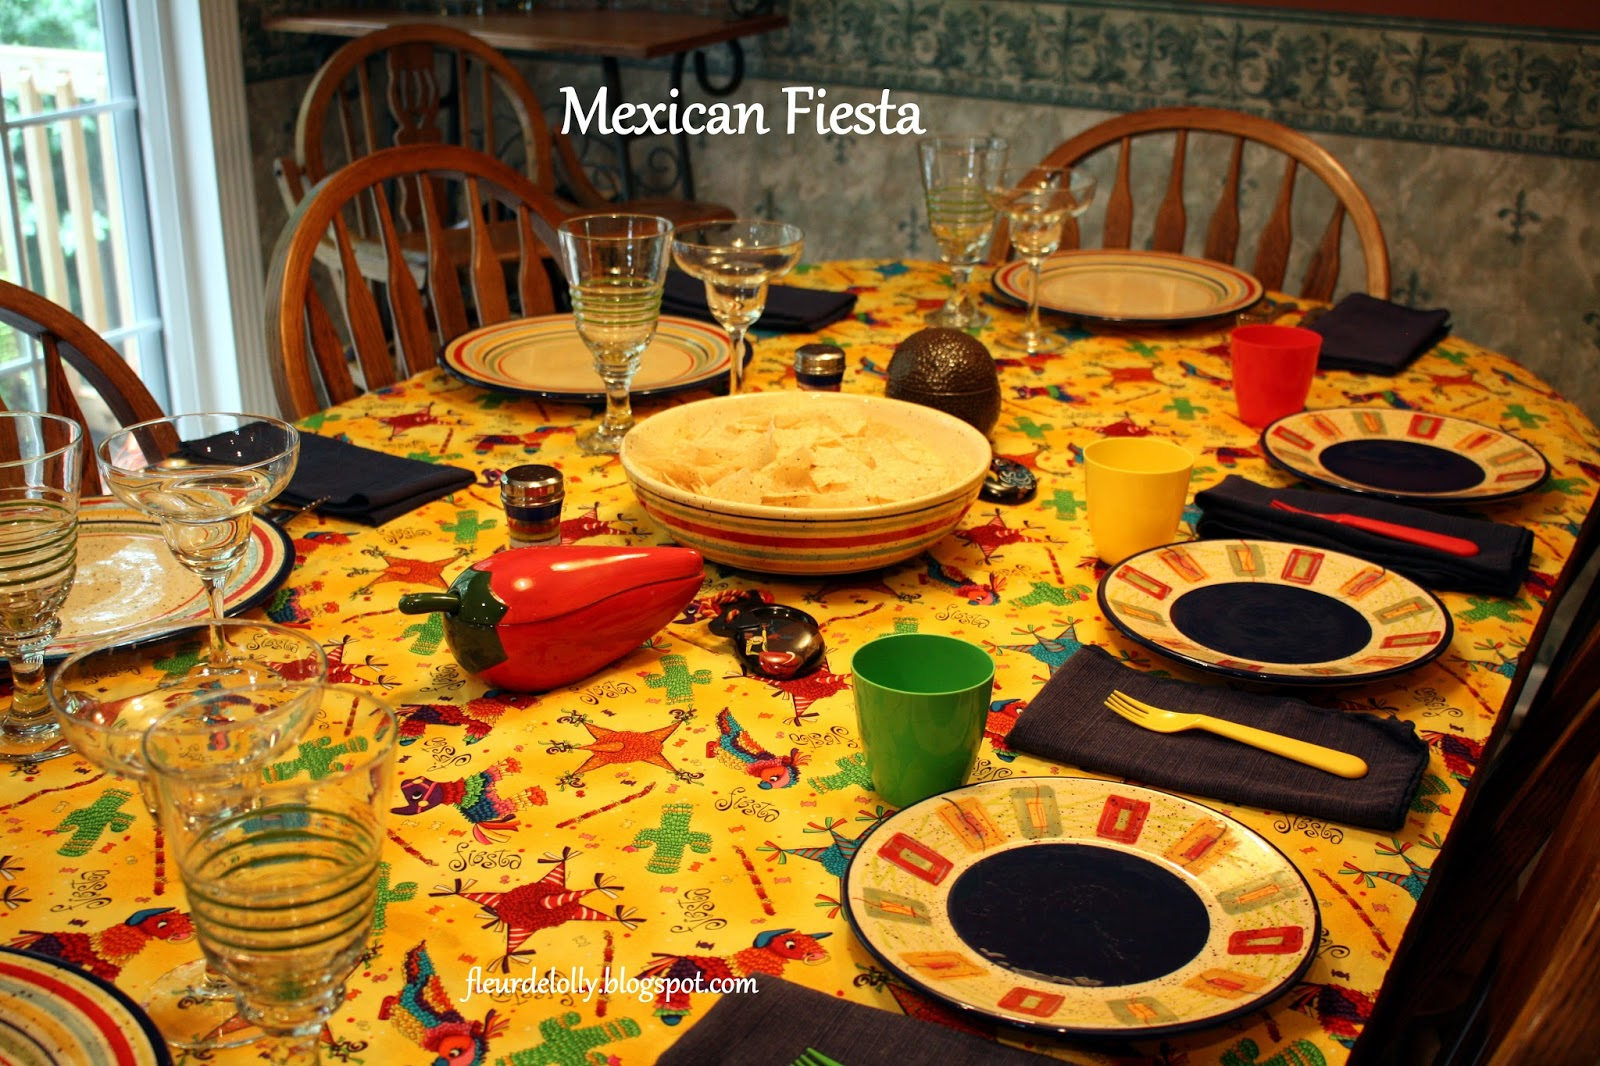 Fleur de Lolly: Mexican Fiesta Table Setting